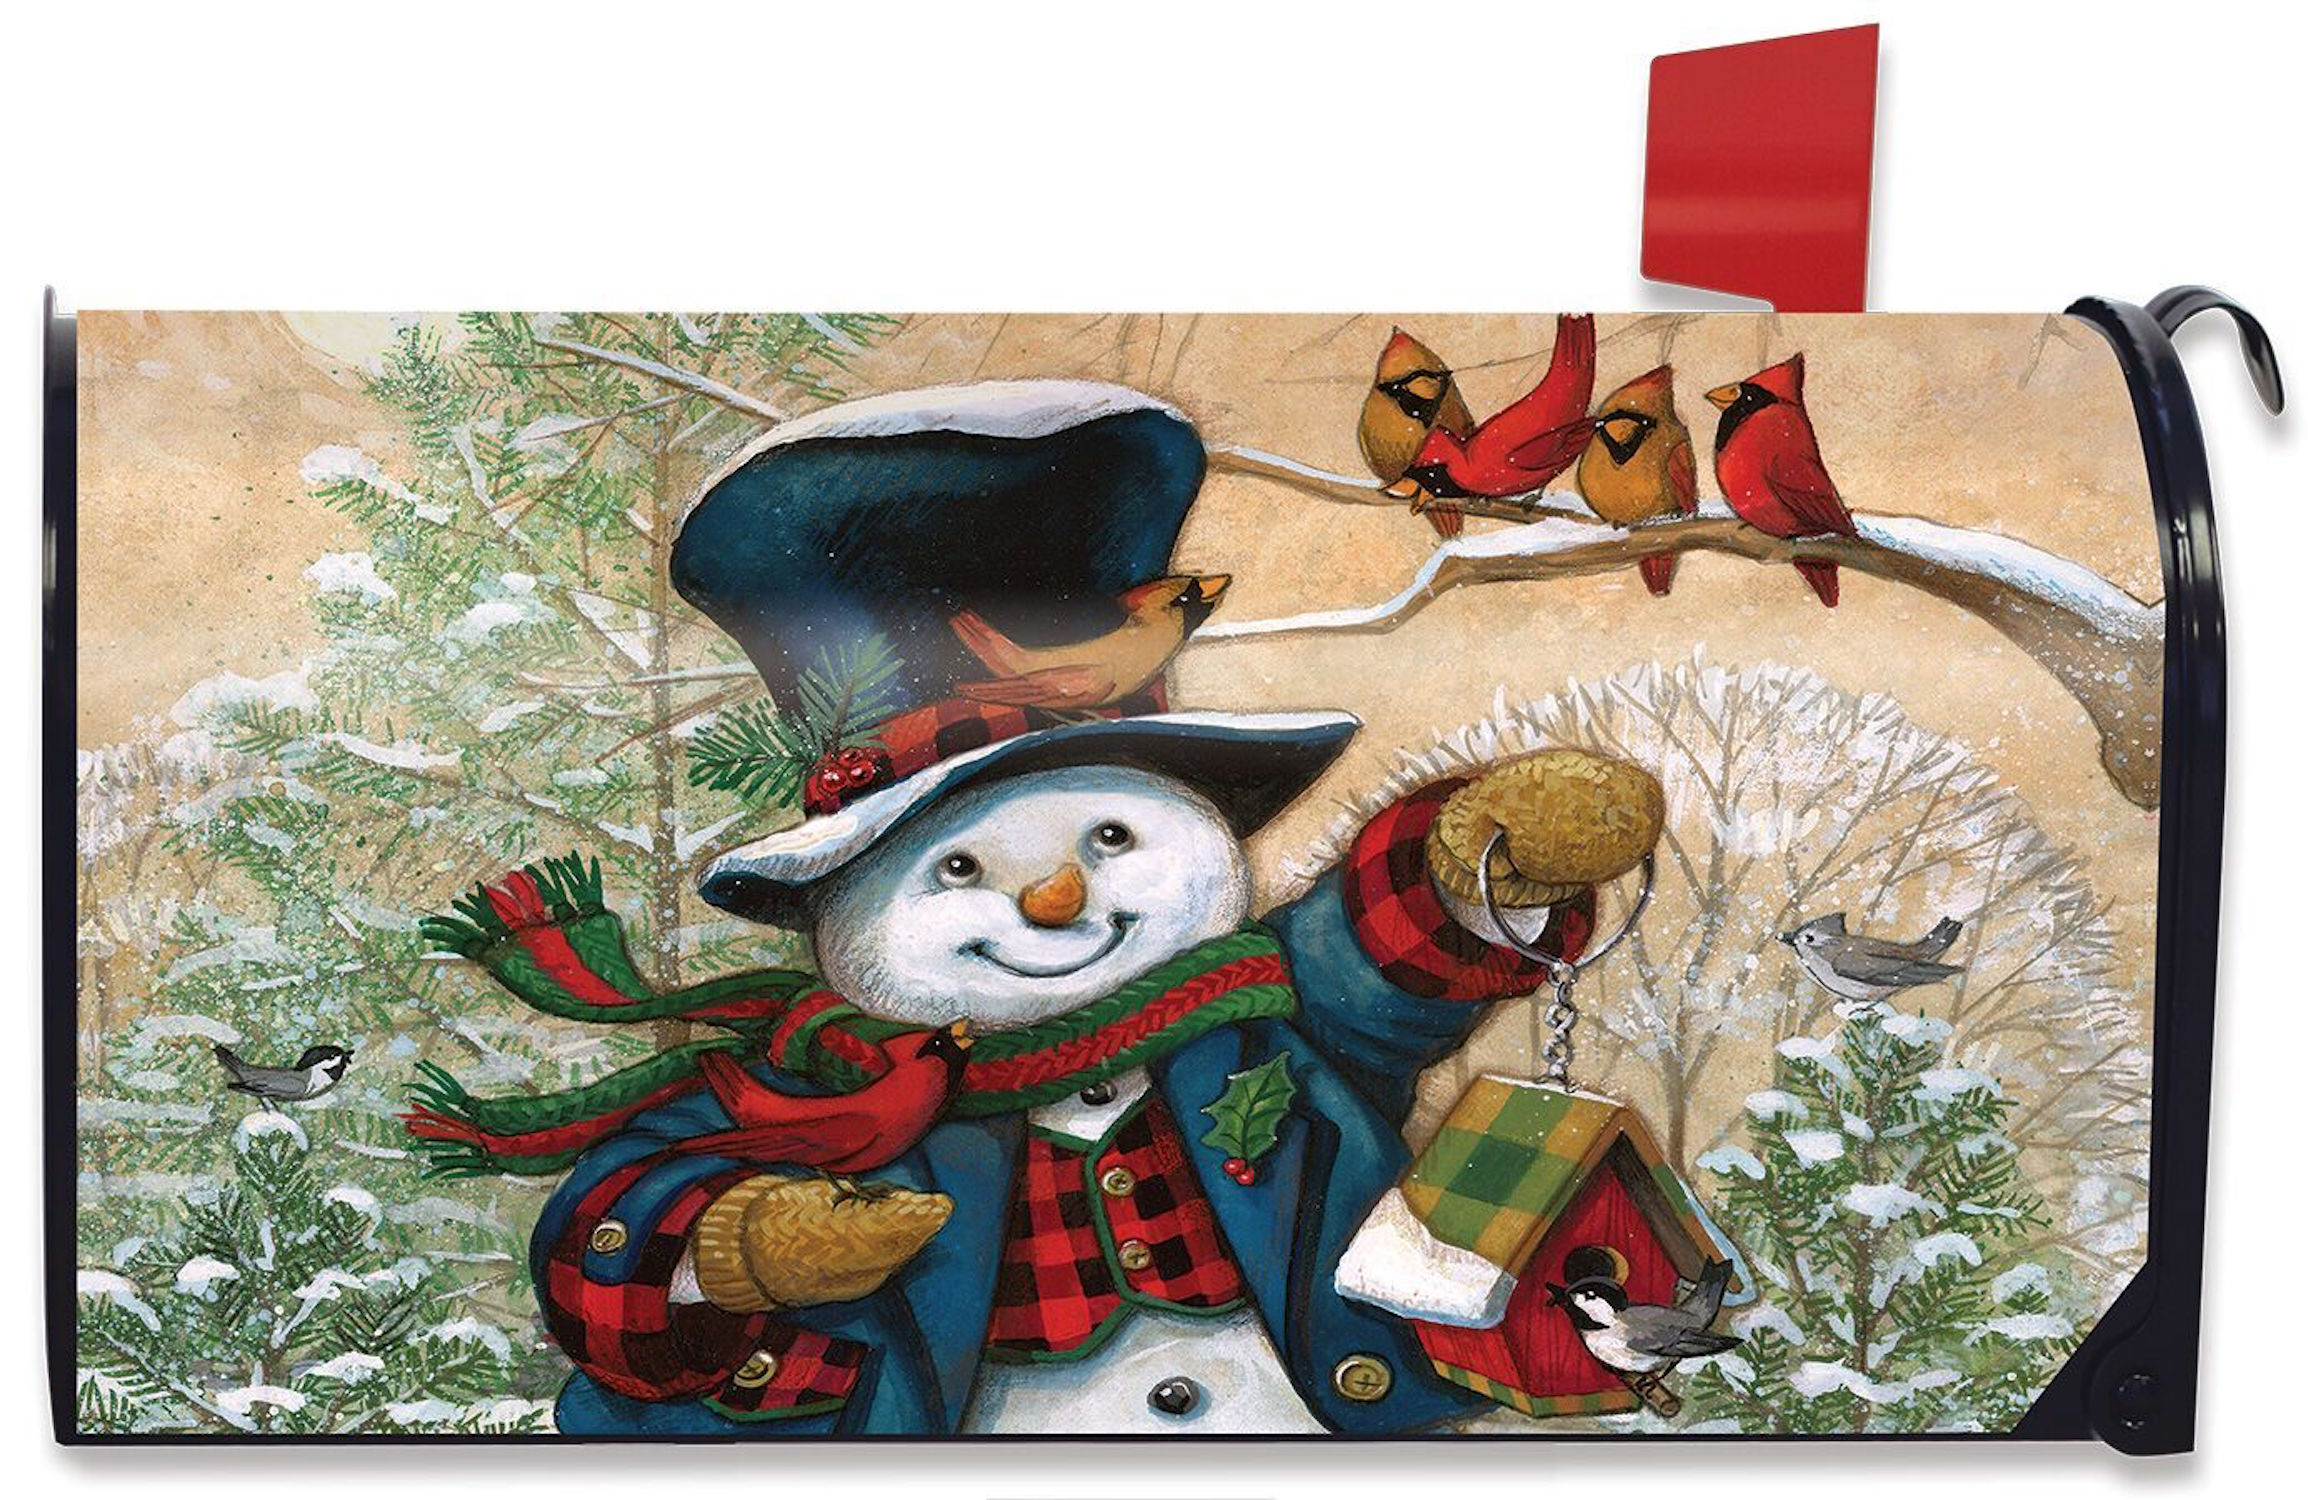 Briarwood Lane Celebrate Winter Snowman Large Mailbox Cover Primitive *Oversized*